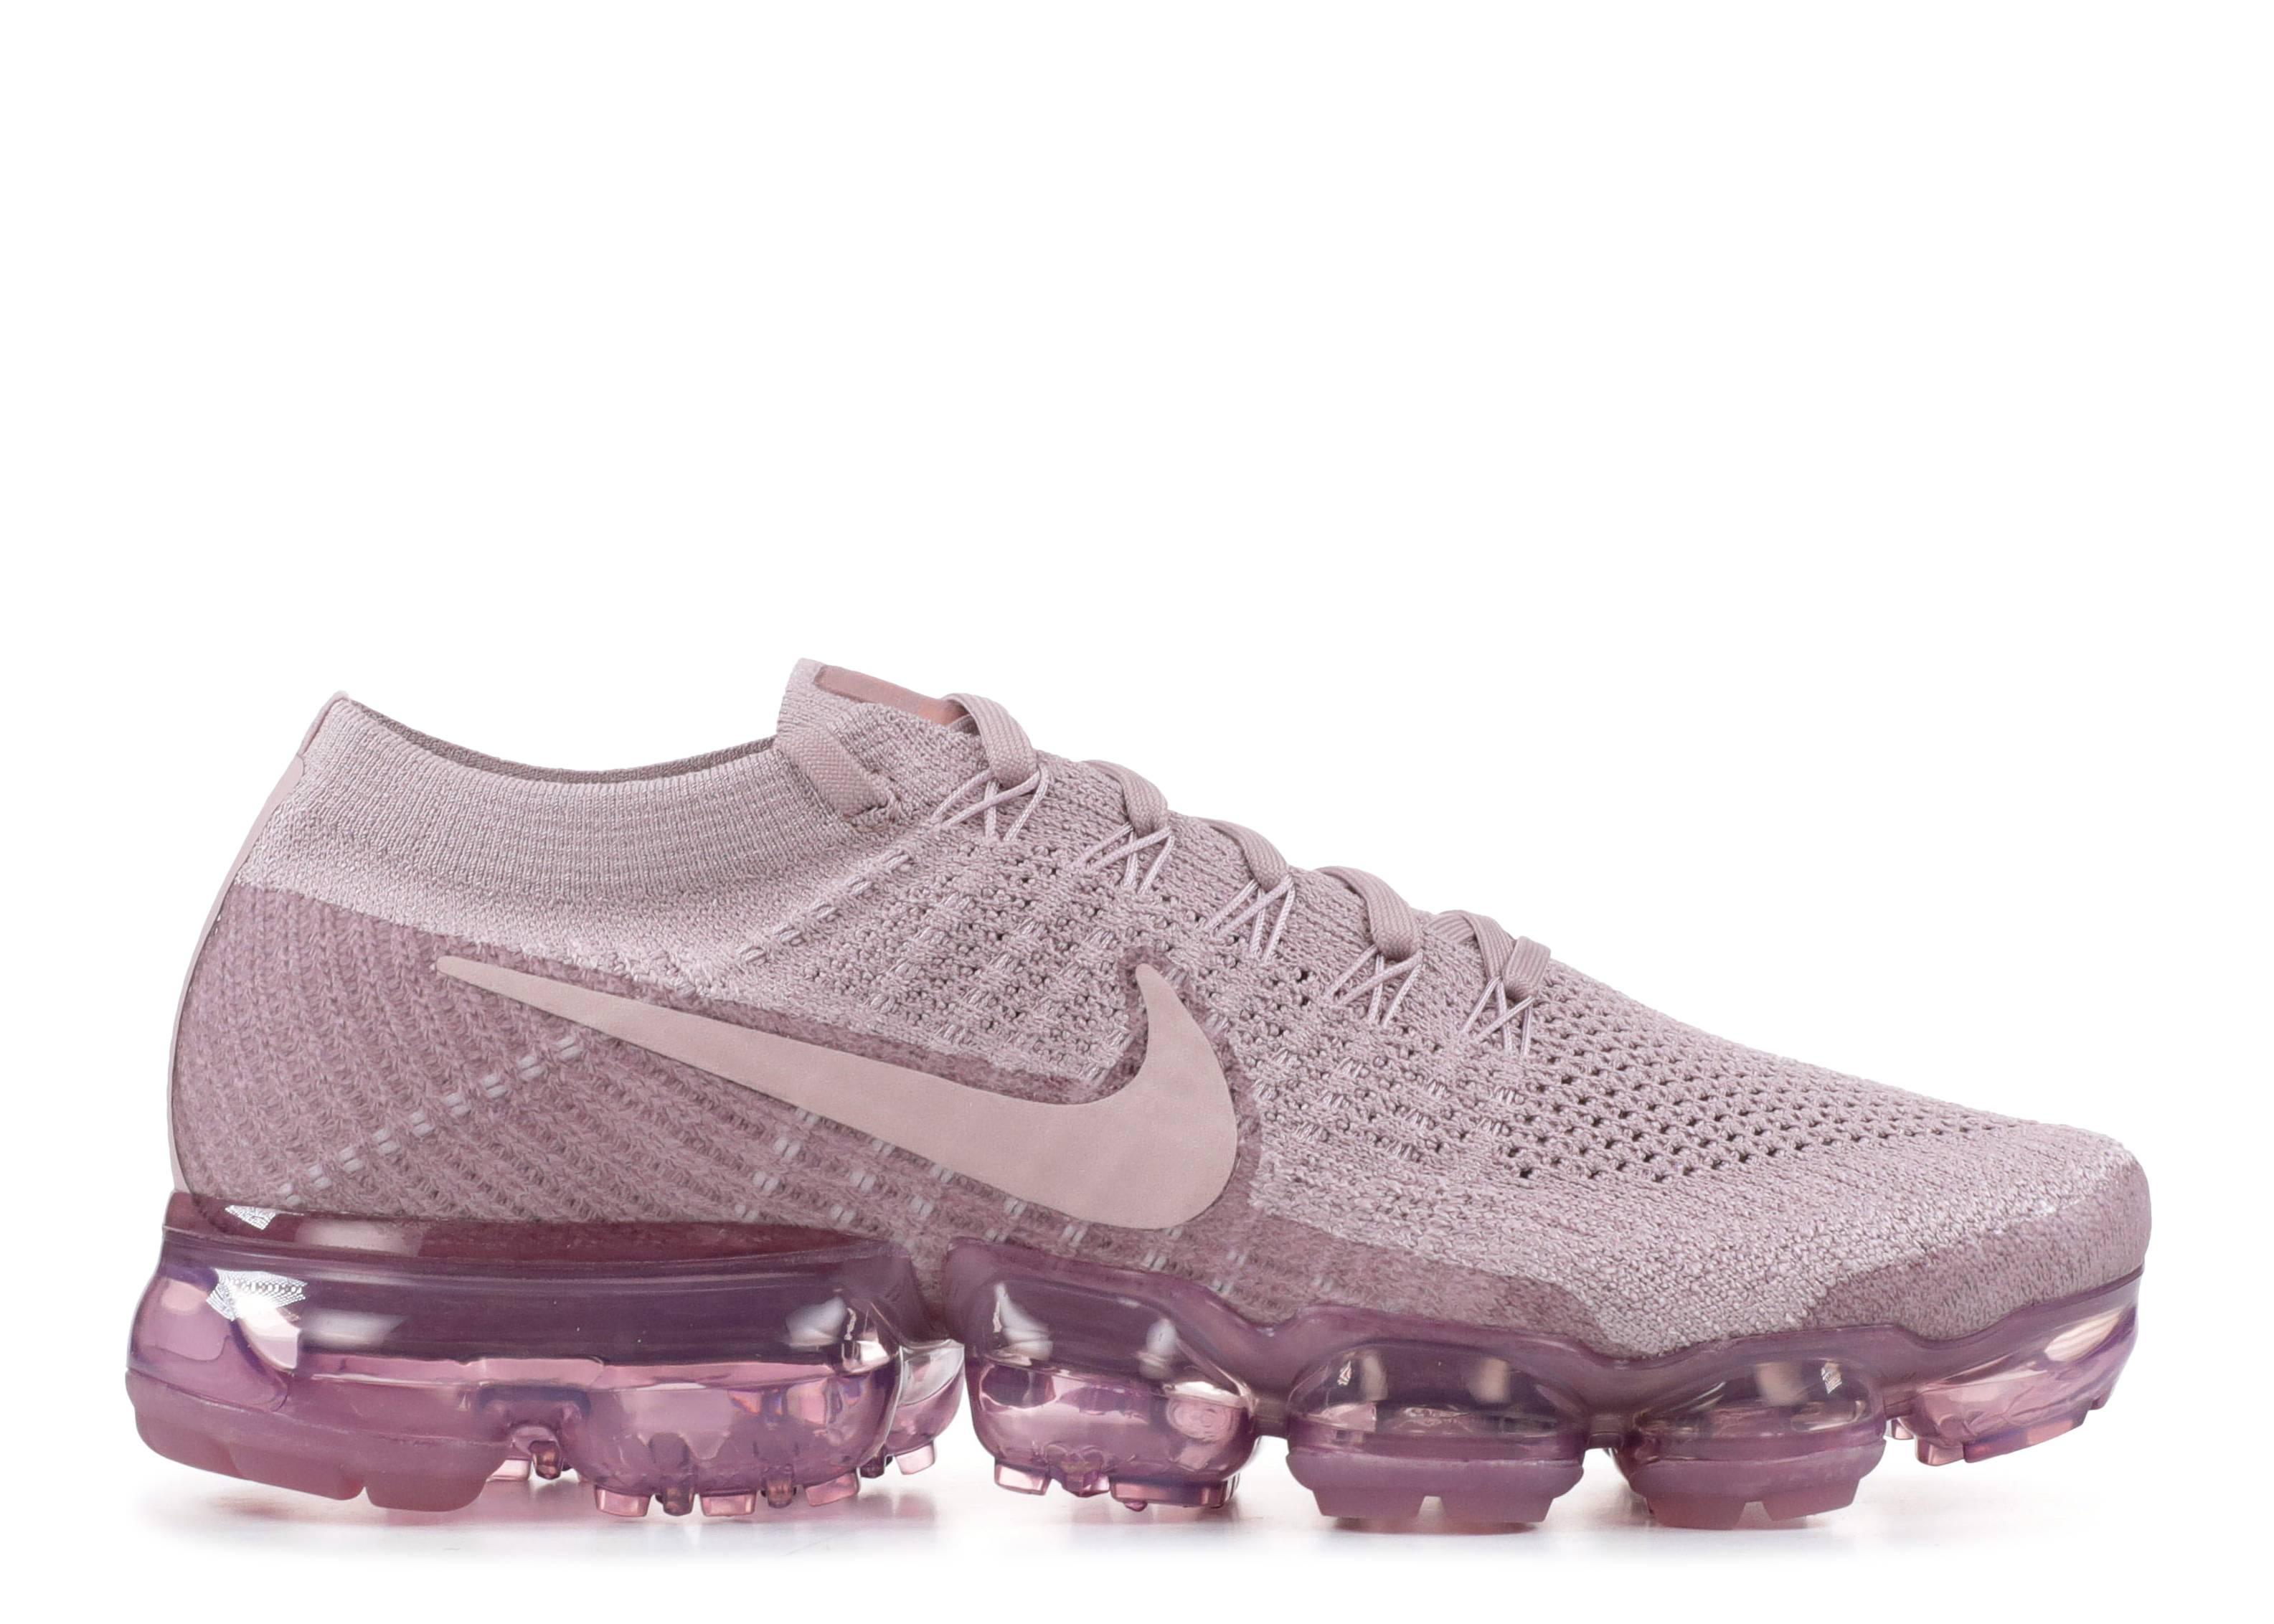 Wmns Nike Air Vapormax Flyknit - Nike - 849557 502 - plum fog plum ... 7d9f5e3ceb